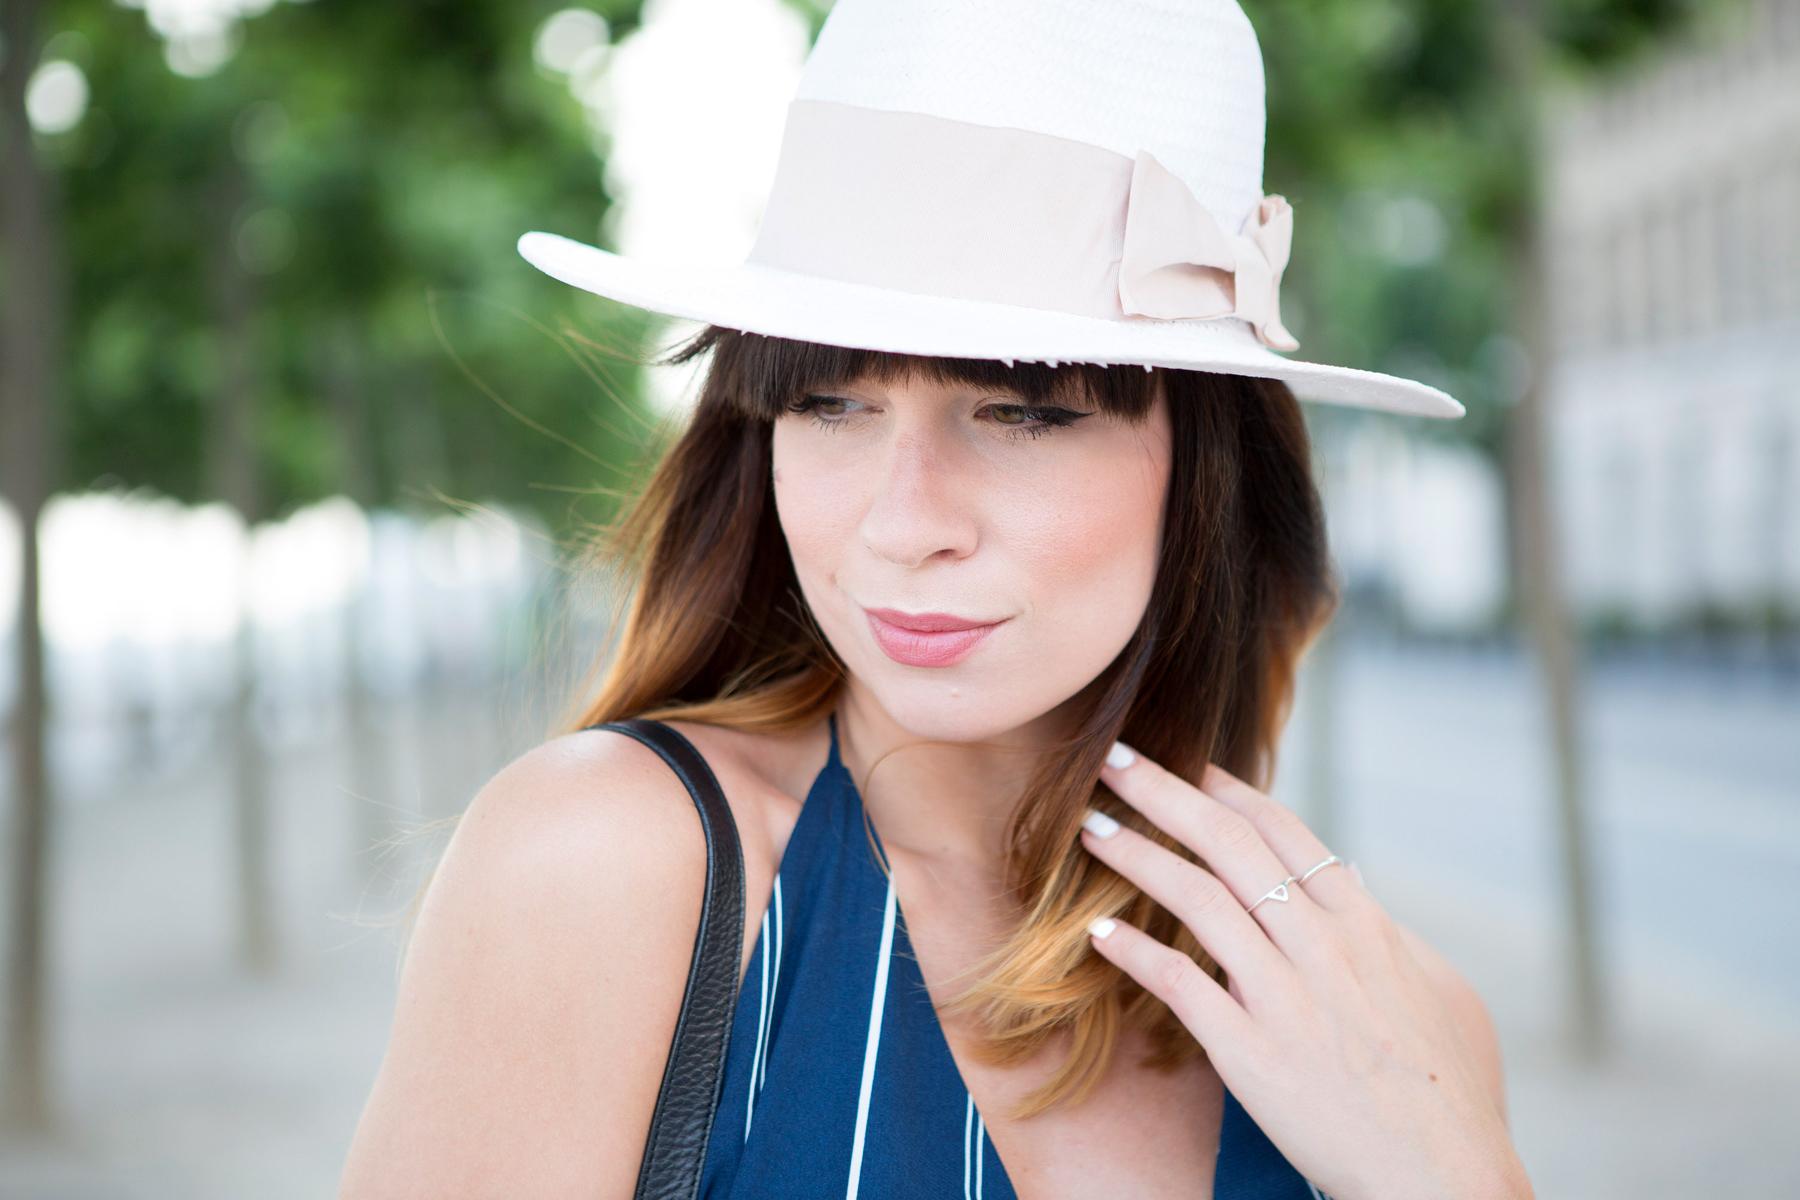 forever 21 jumpsuit overall streifen blue hat summer ombre cats & dogs ricarda schernus blogger berlin 5